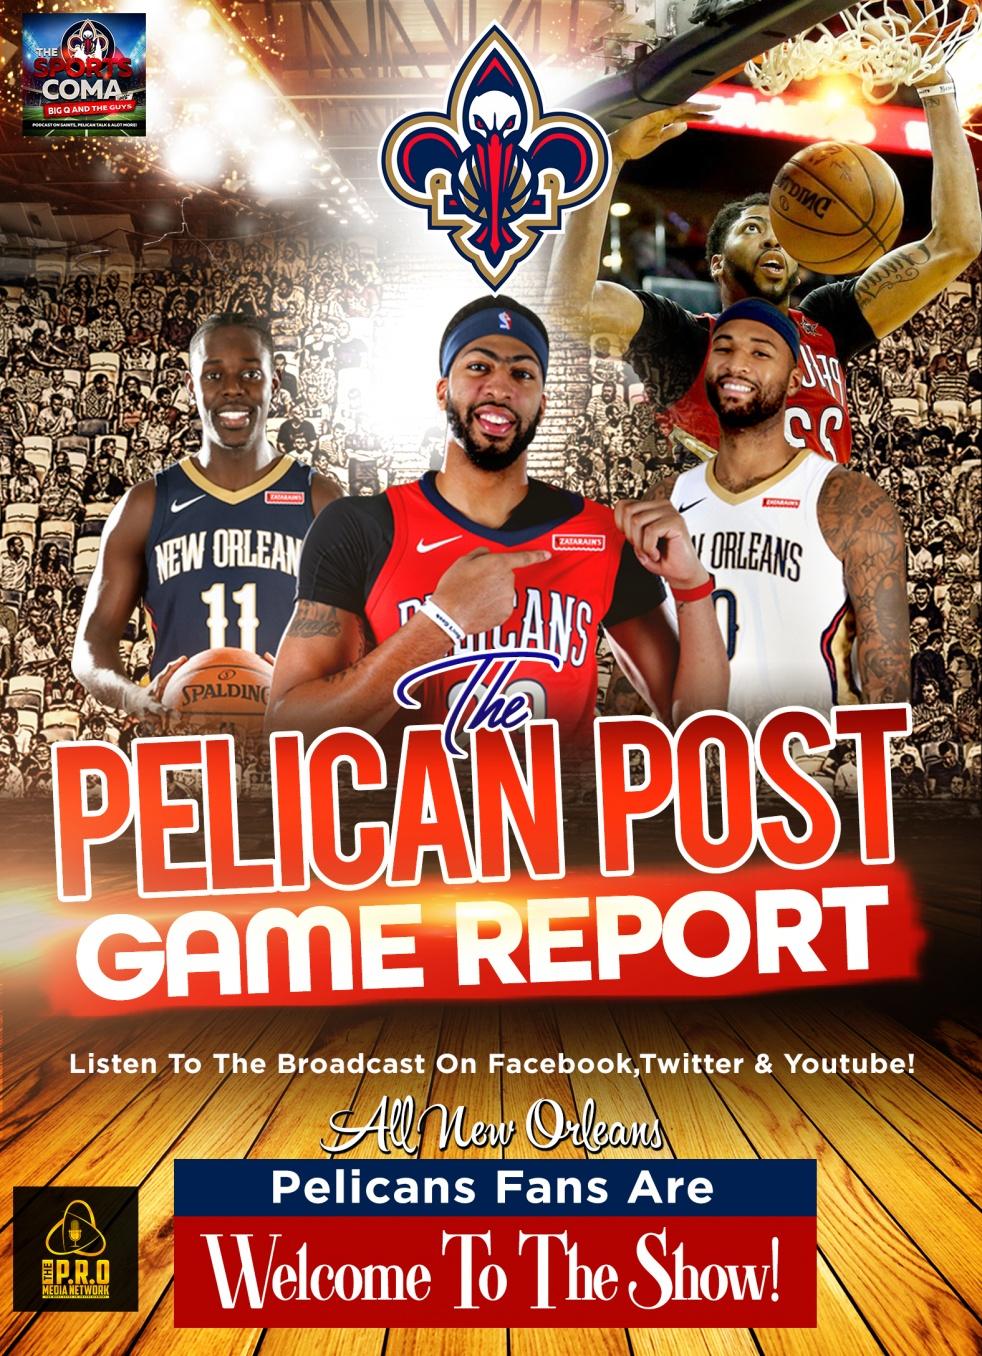 The Pelican Post Game Report - imagen de show de portada